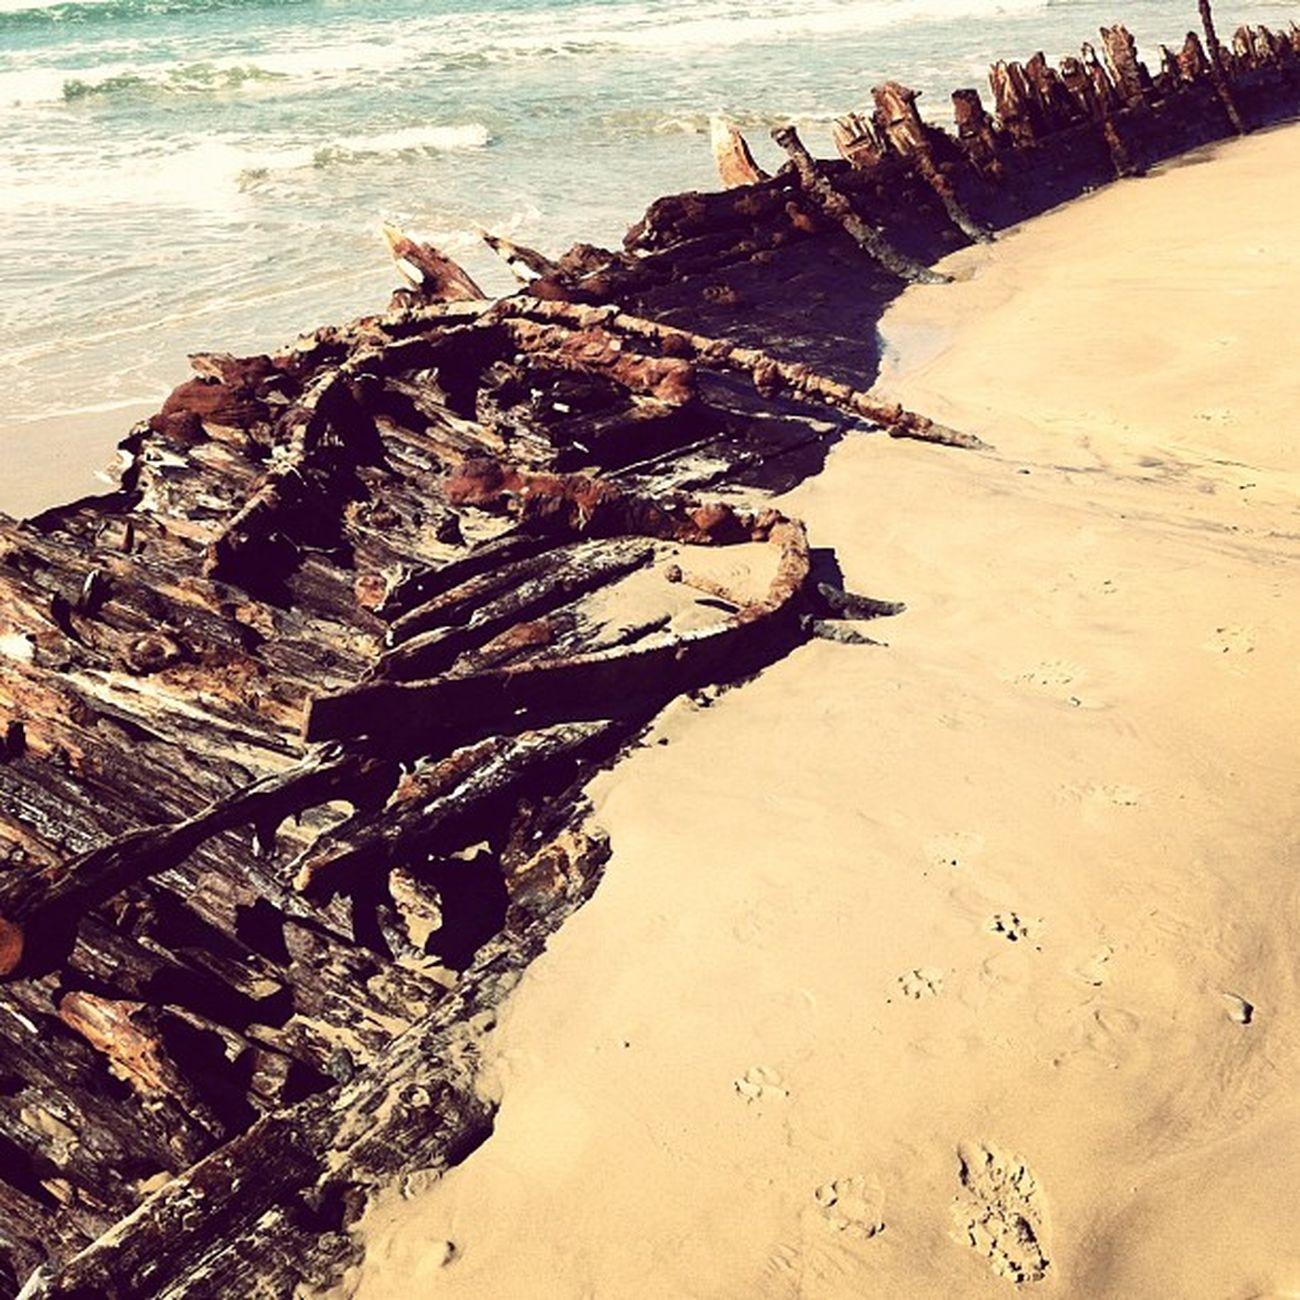 Ship Shipwreck Buster Ocean beach beauty